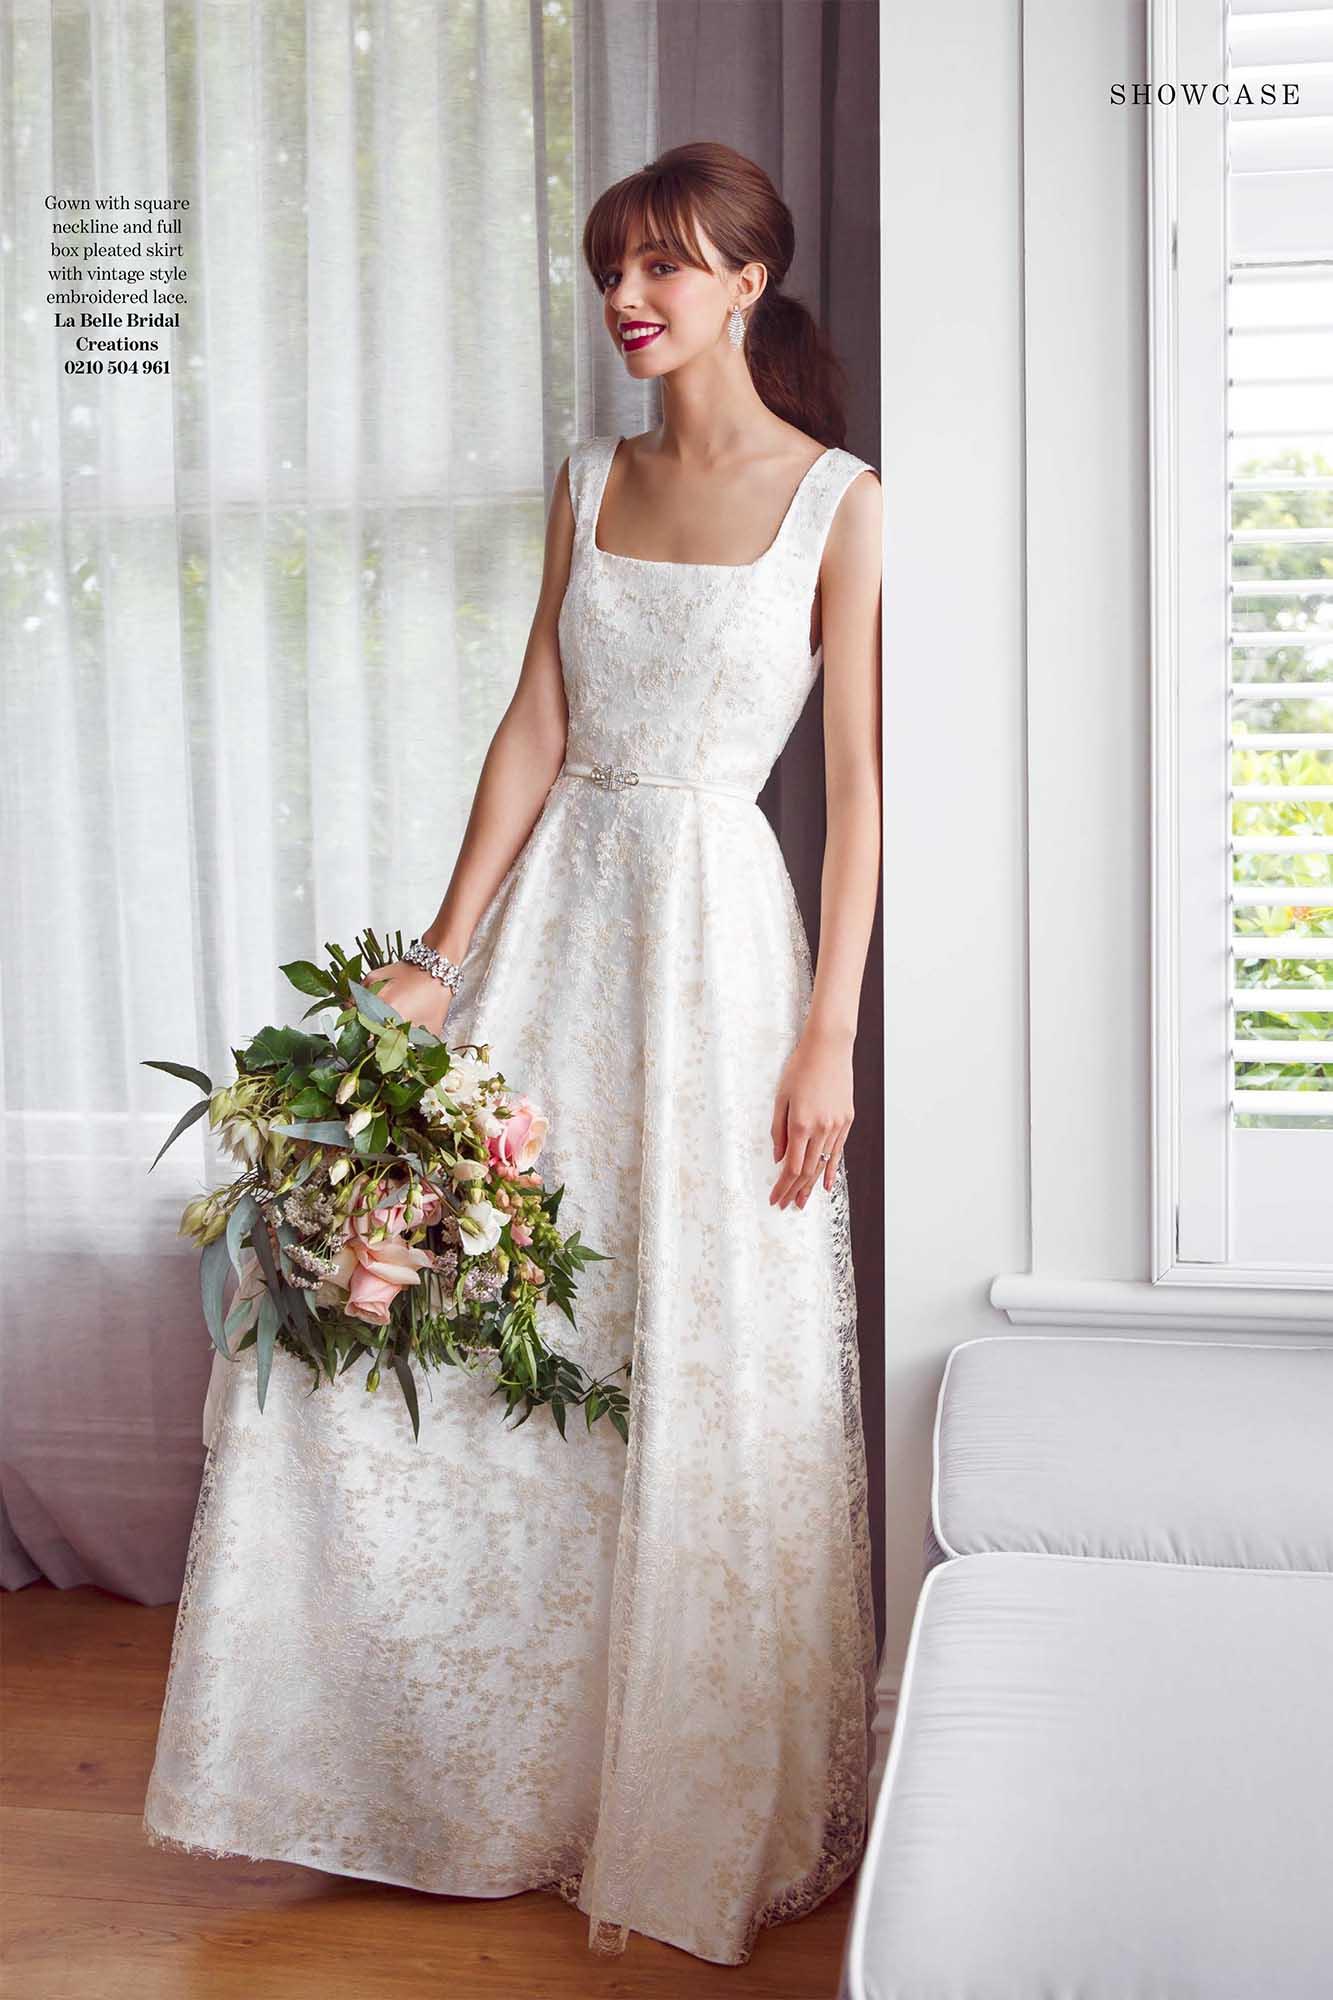 NZW61 La Belle Bridal small.jpg